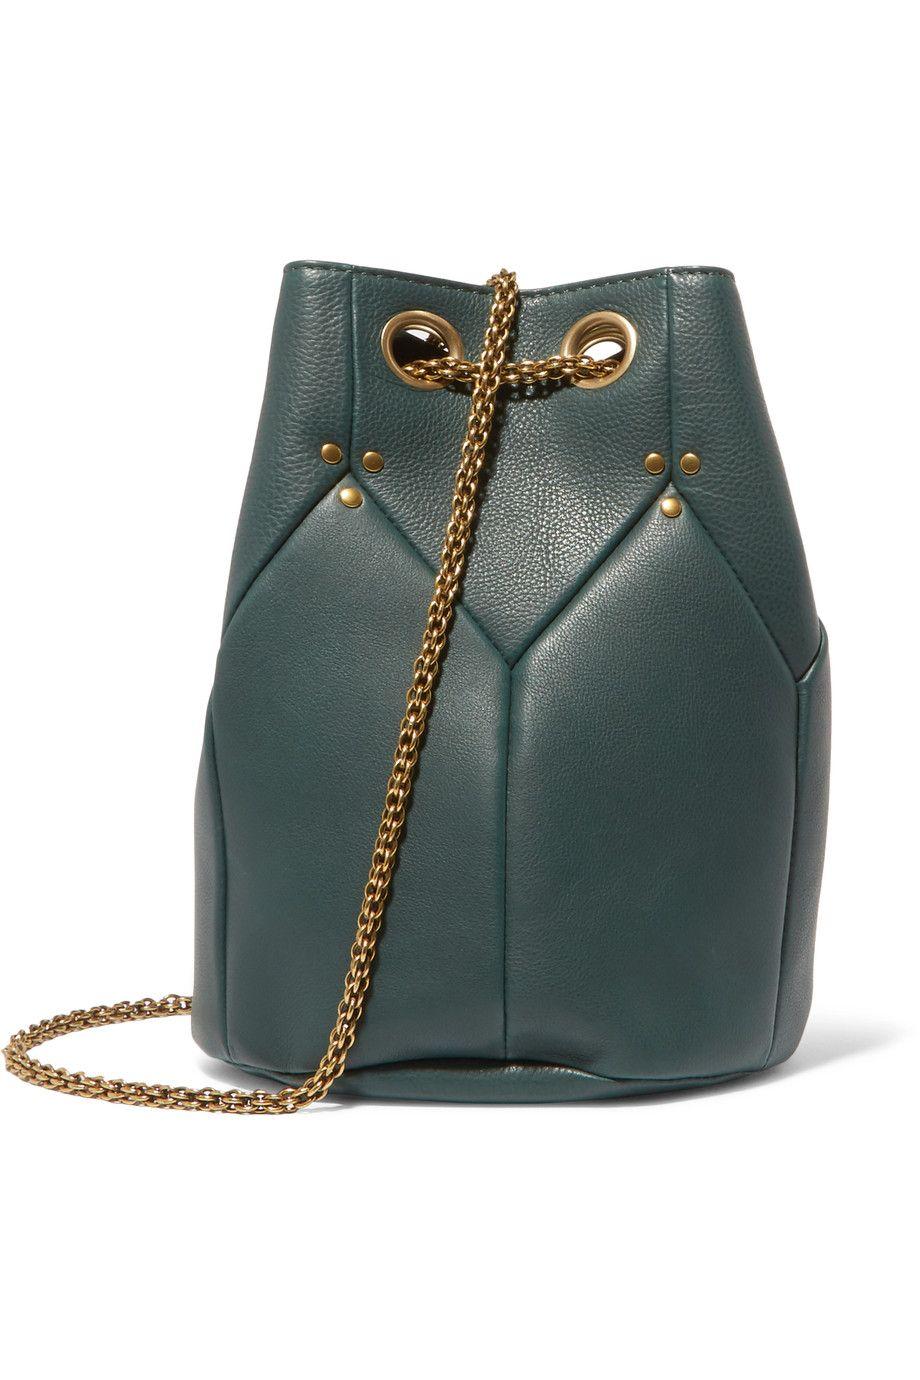 48b07e884d JÉRÔME DREYFUSS Popeye Textured-Leather Shoulder Bag.  jérômedreyfuss  bags   shoulder bags  leather